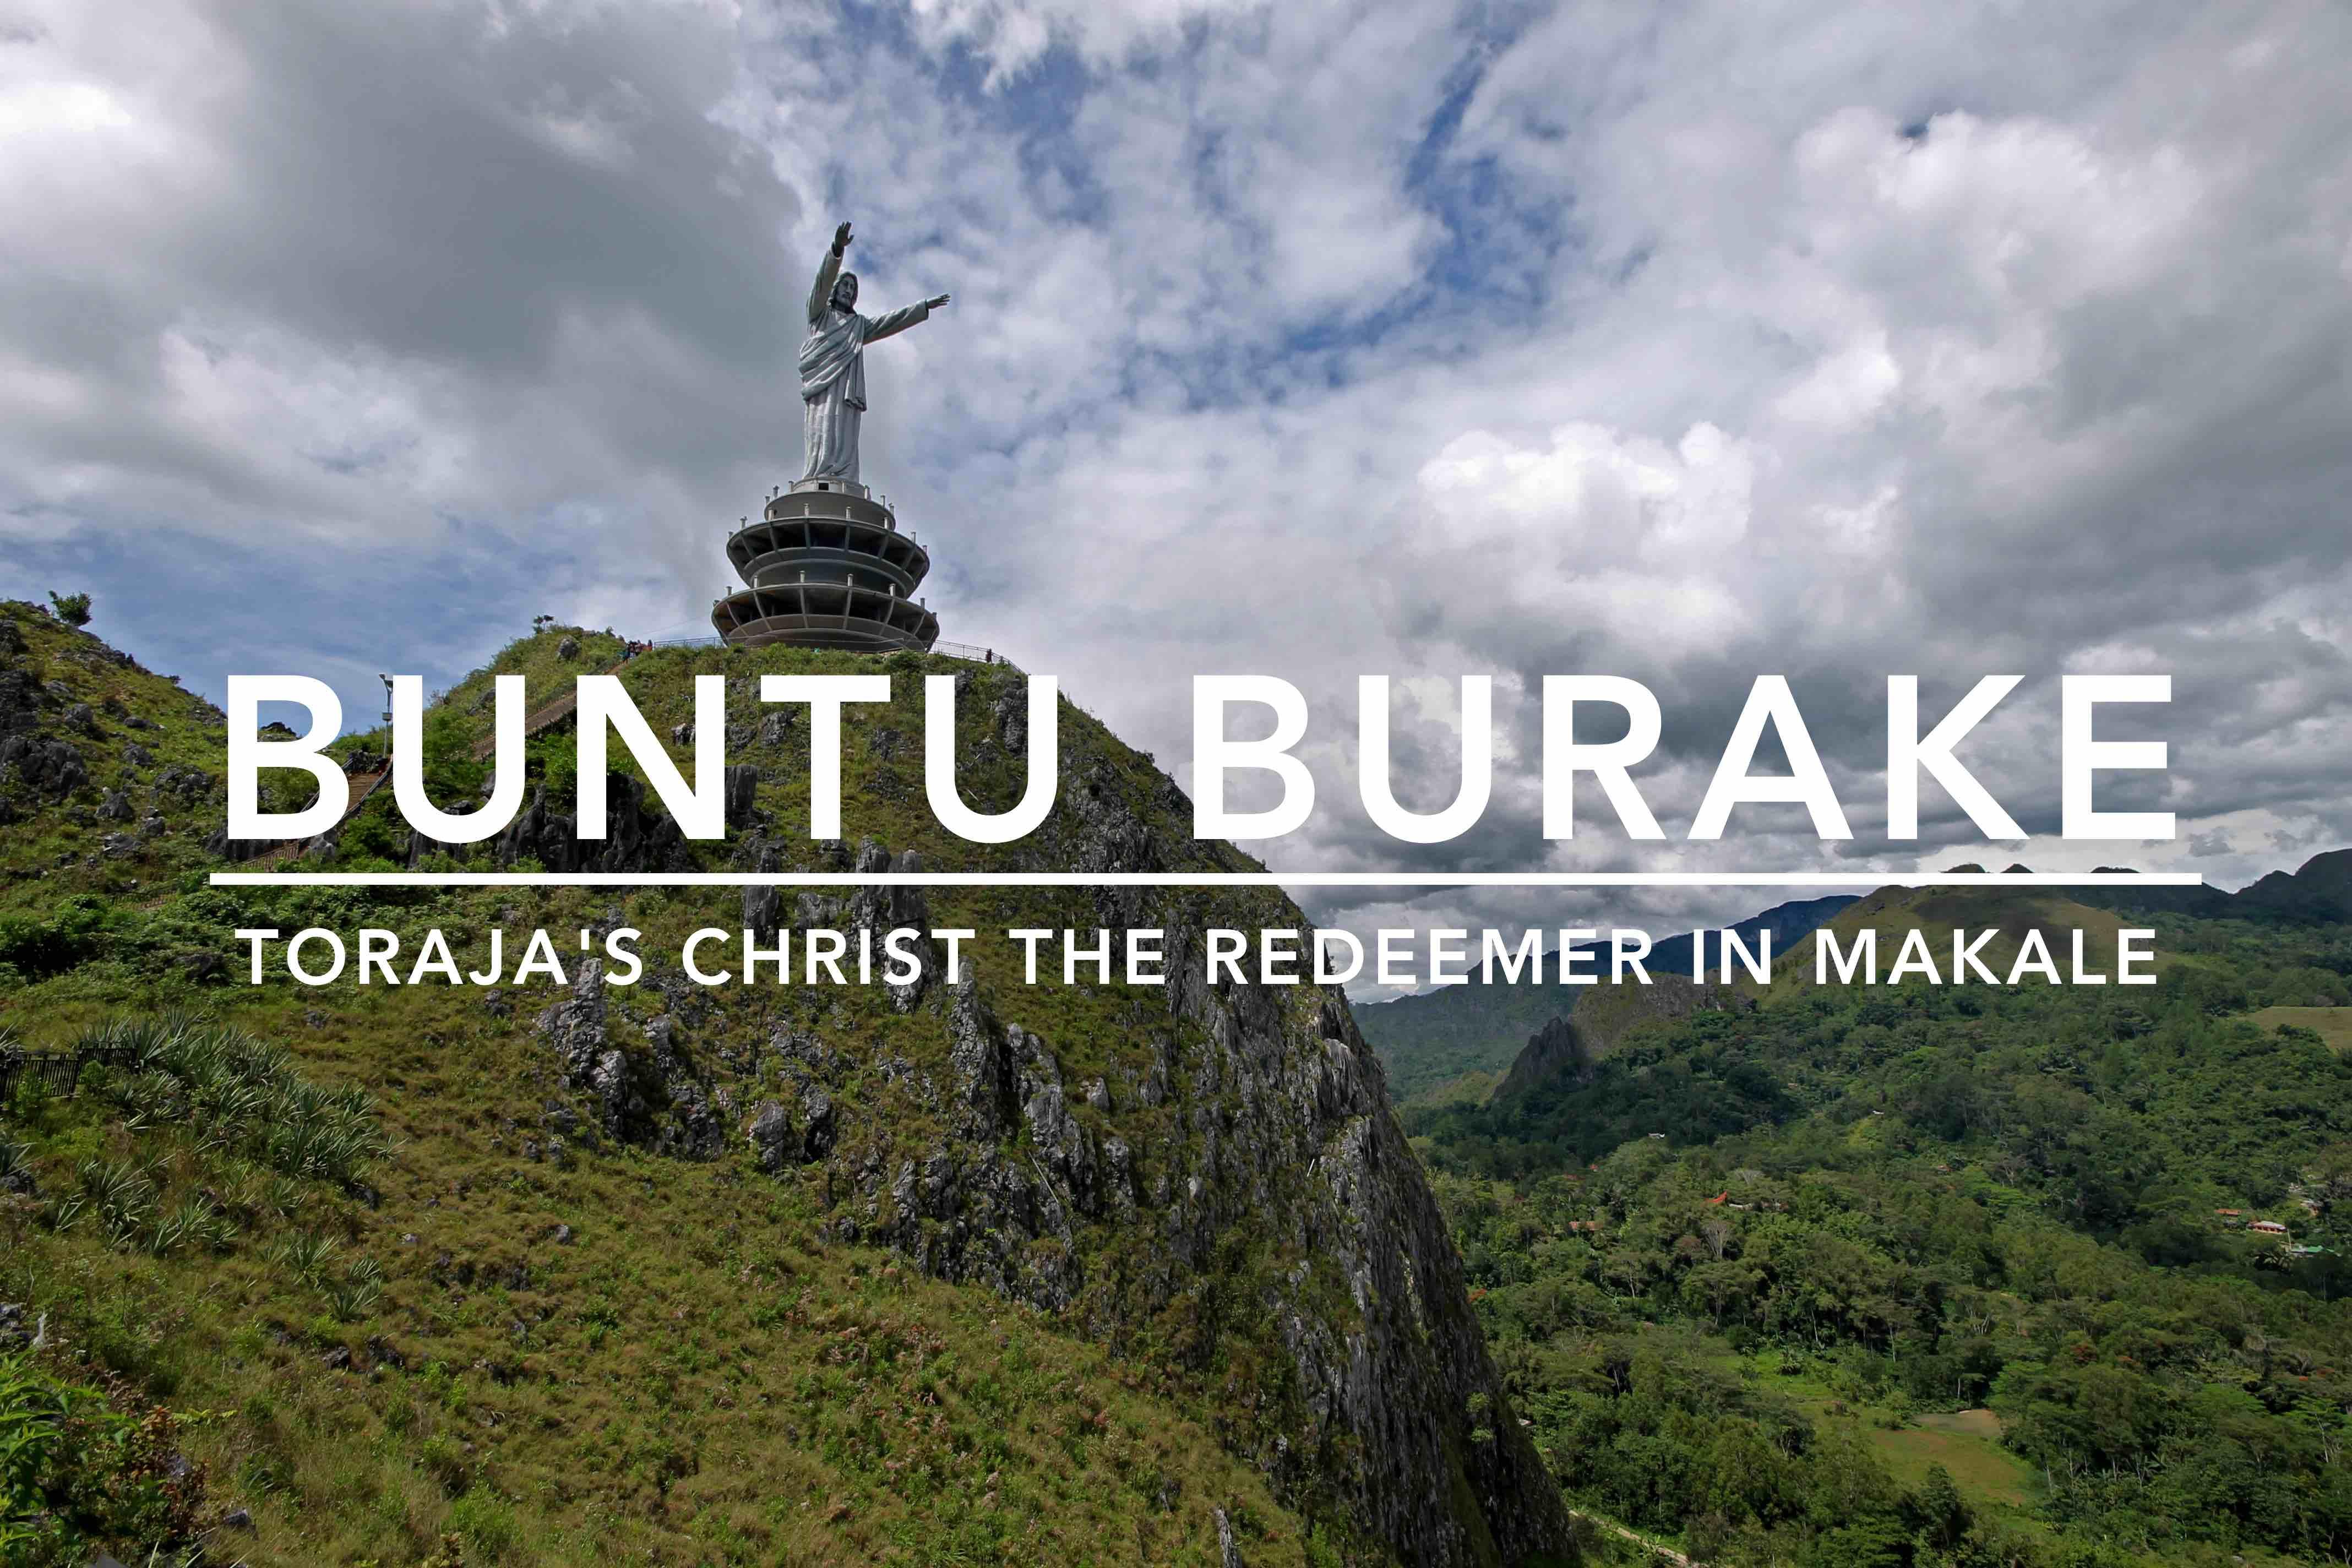 World S Tallest Jesus Christ Statue In Makale Tana Toraja South